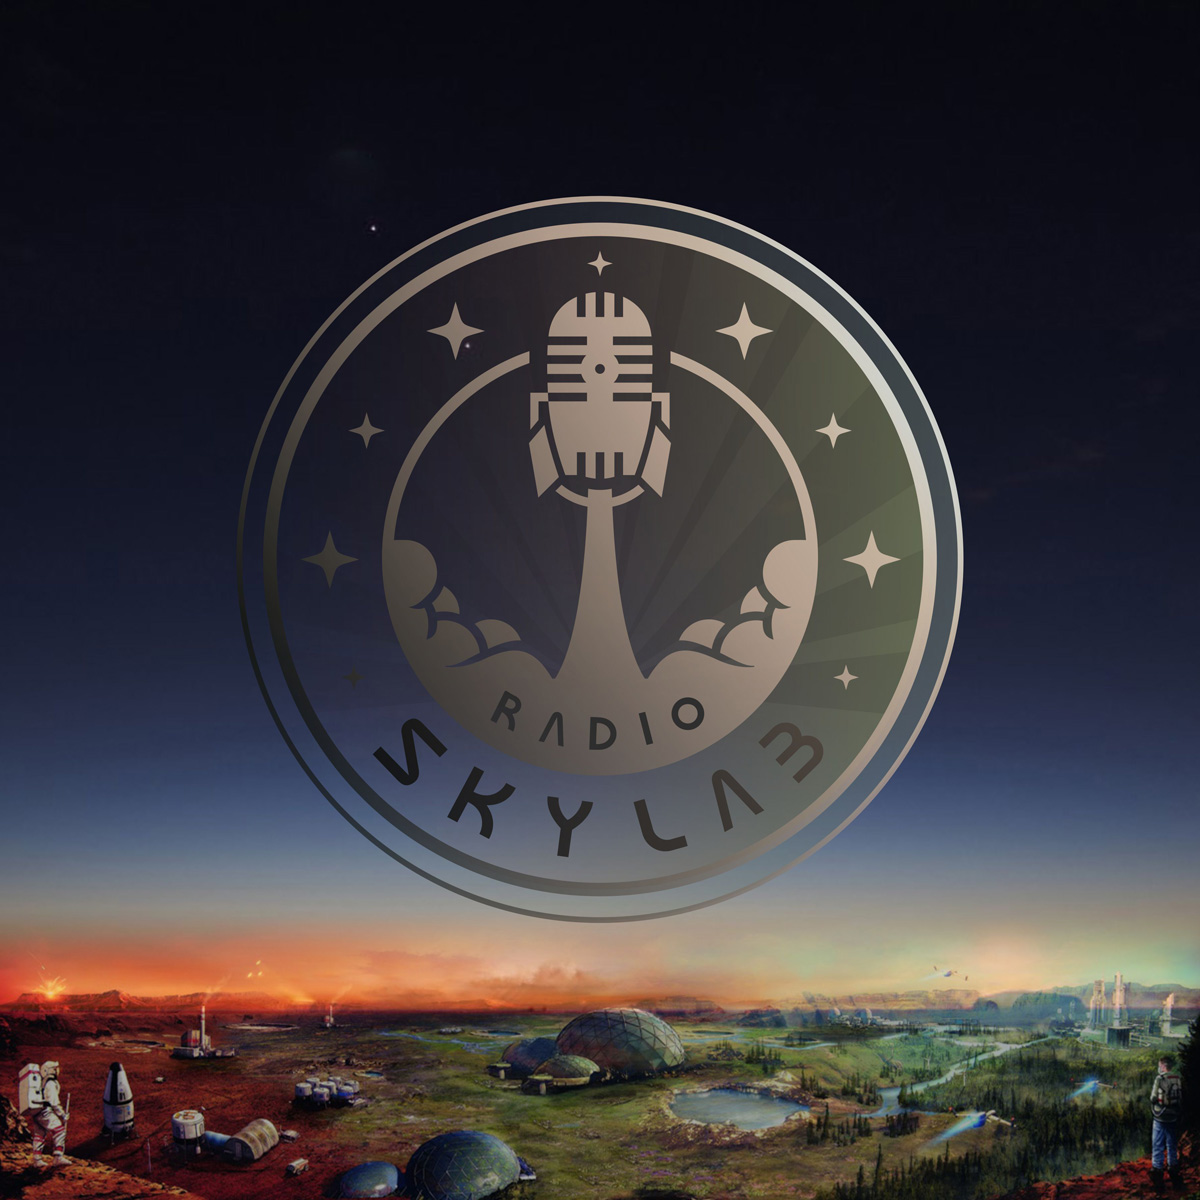 Radio Skylab. Fuente:Radio Skylab